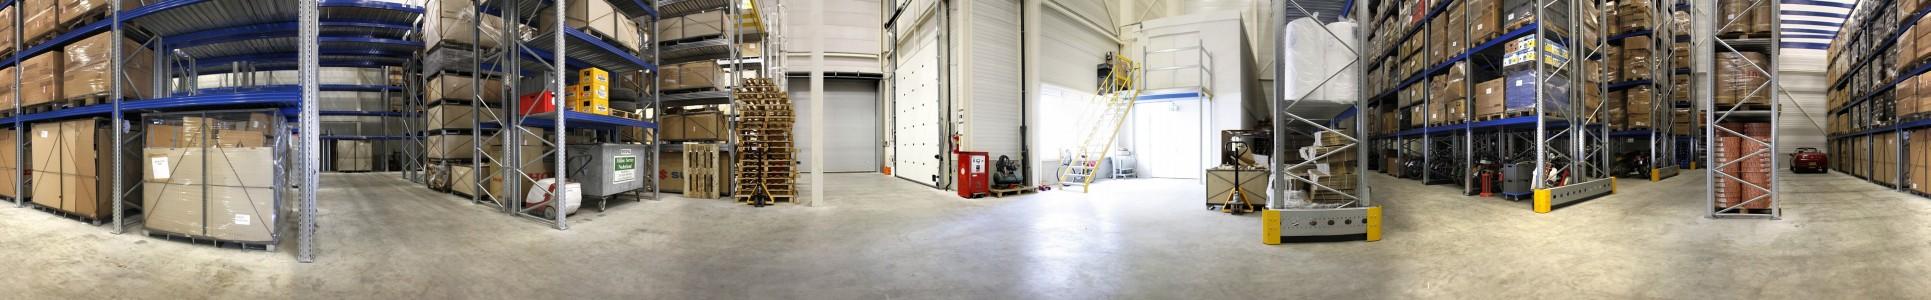 warehouse 2 first floor